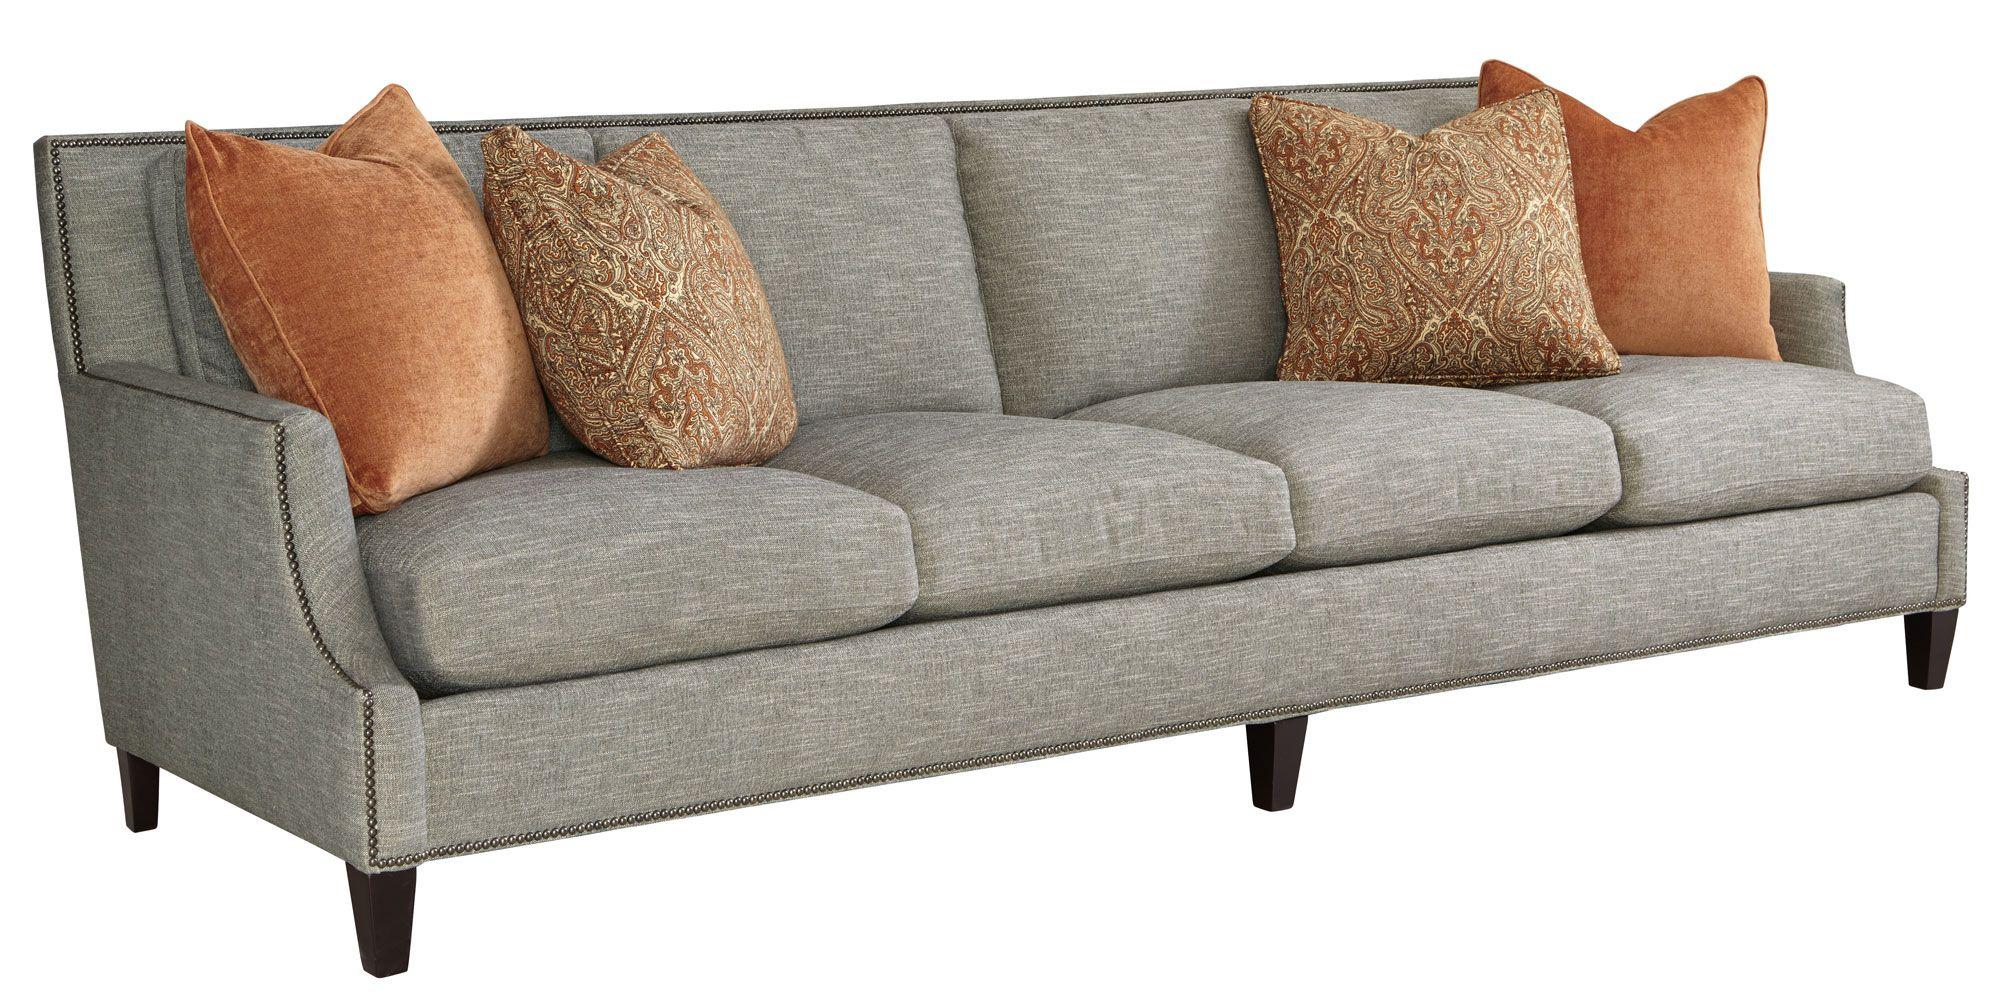 Crawford Sofa For Living Room 80 X 355 X 40h Sofa Material 2832